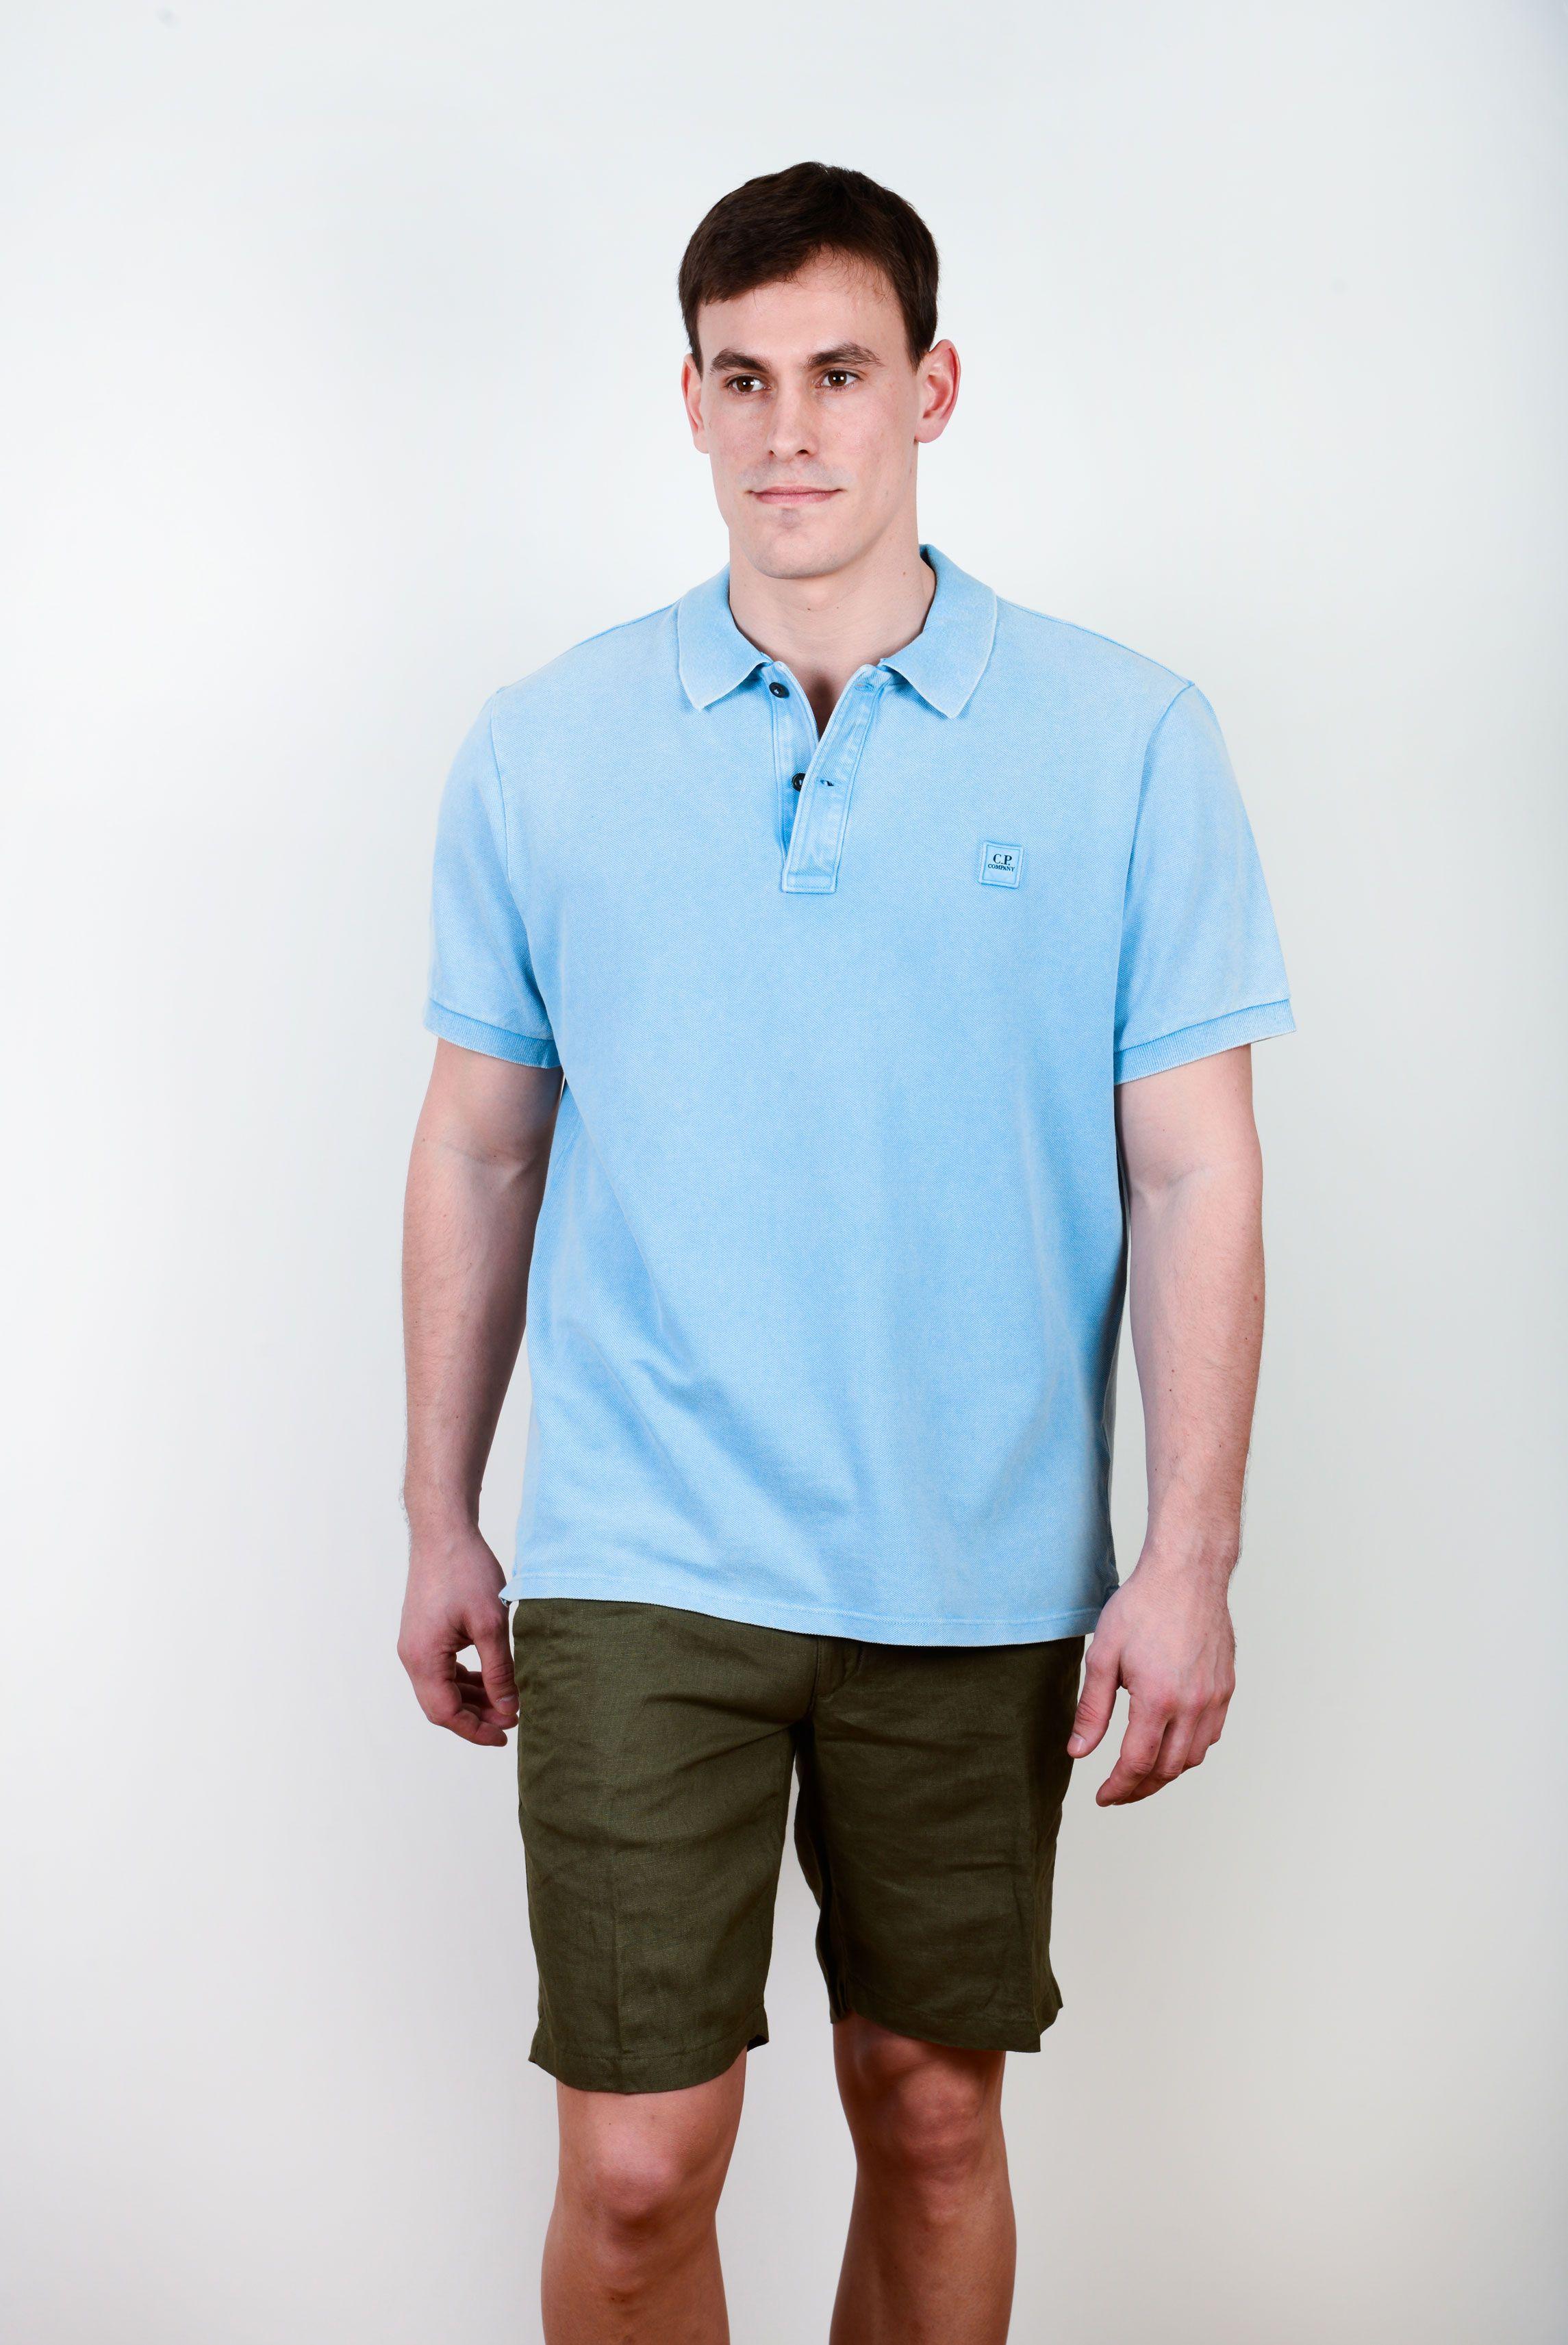 Poloshow poloshirt C.P.Compamy blau 02CMPL184A001672S 6